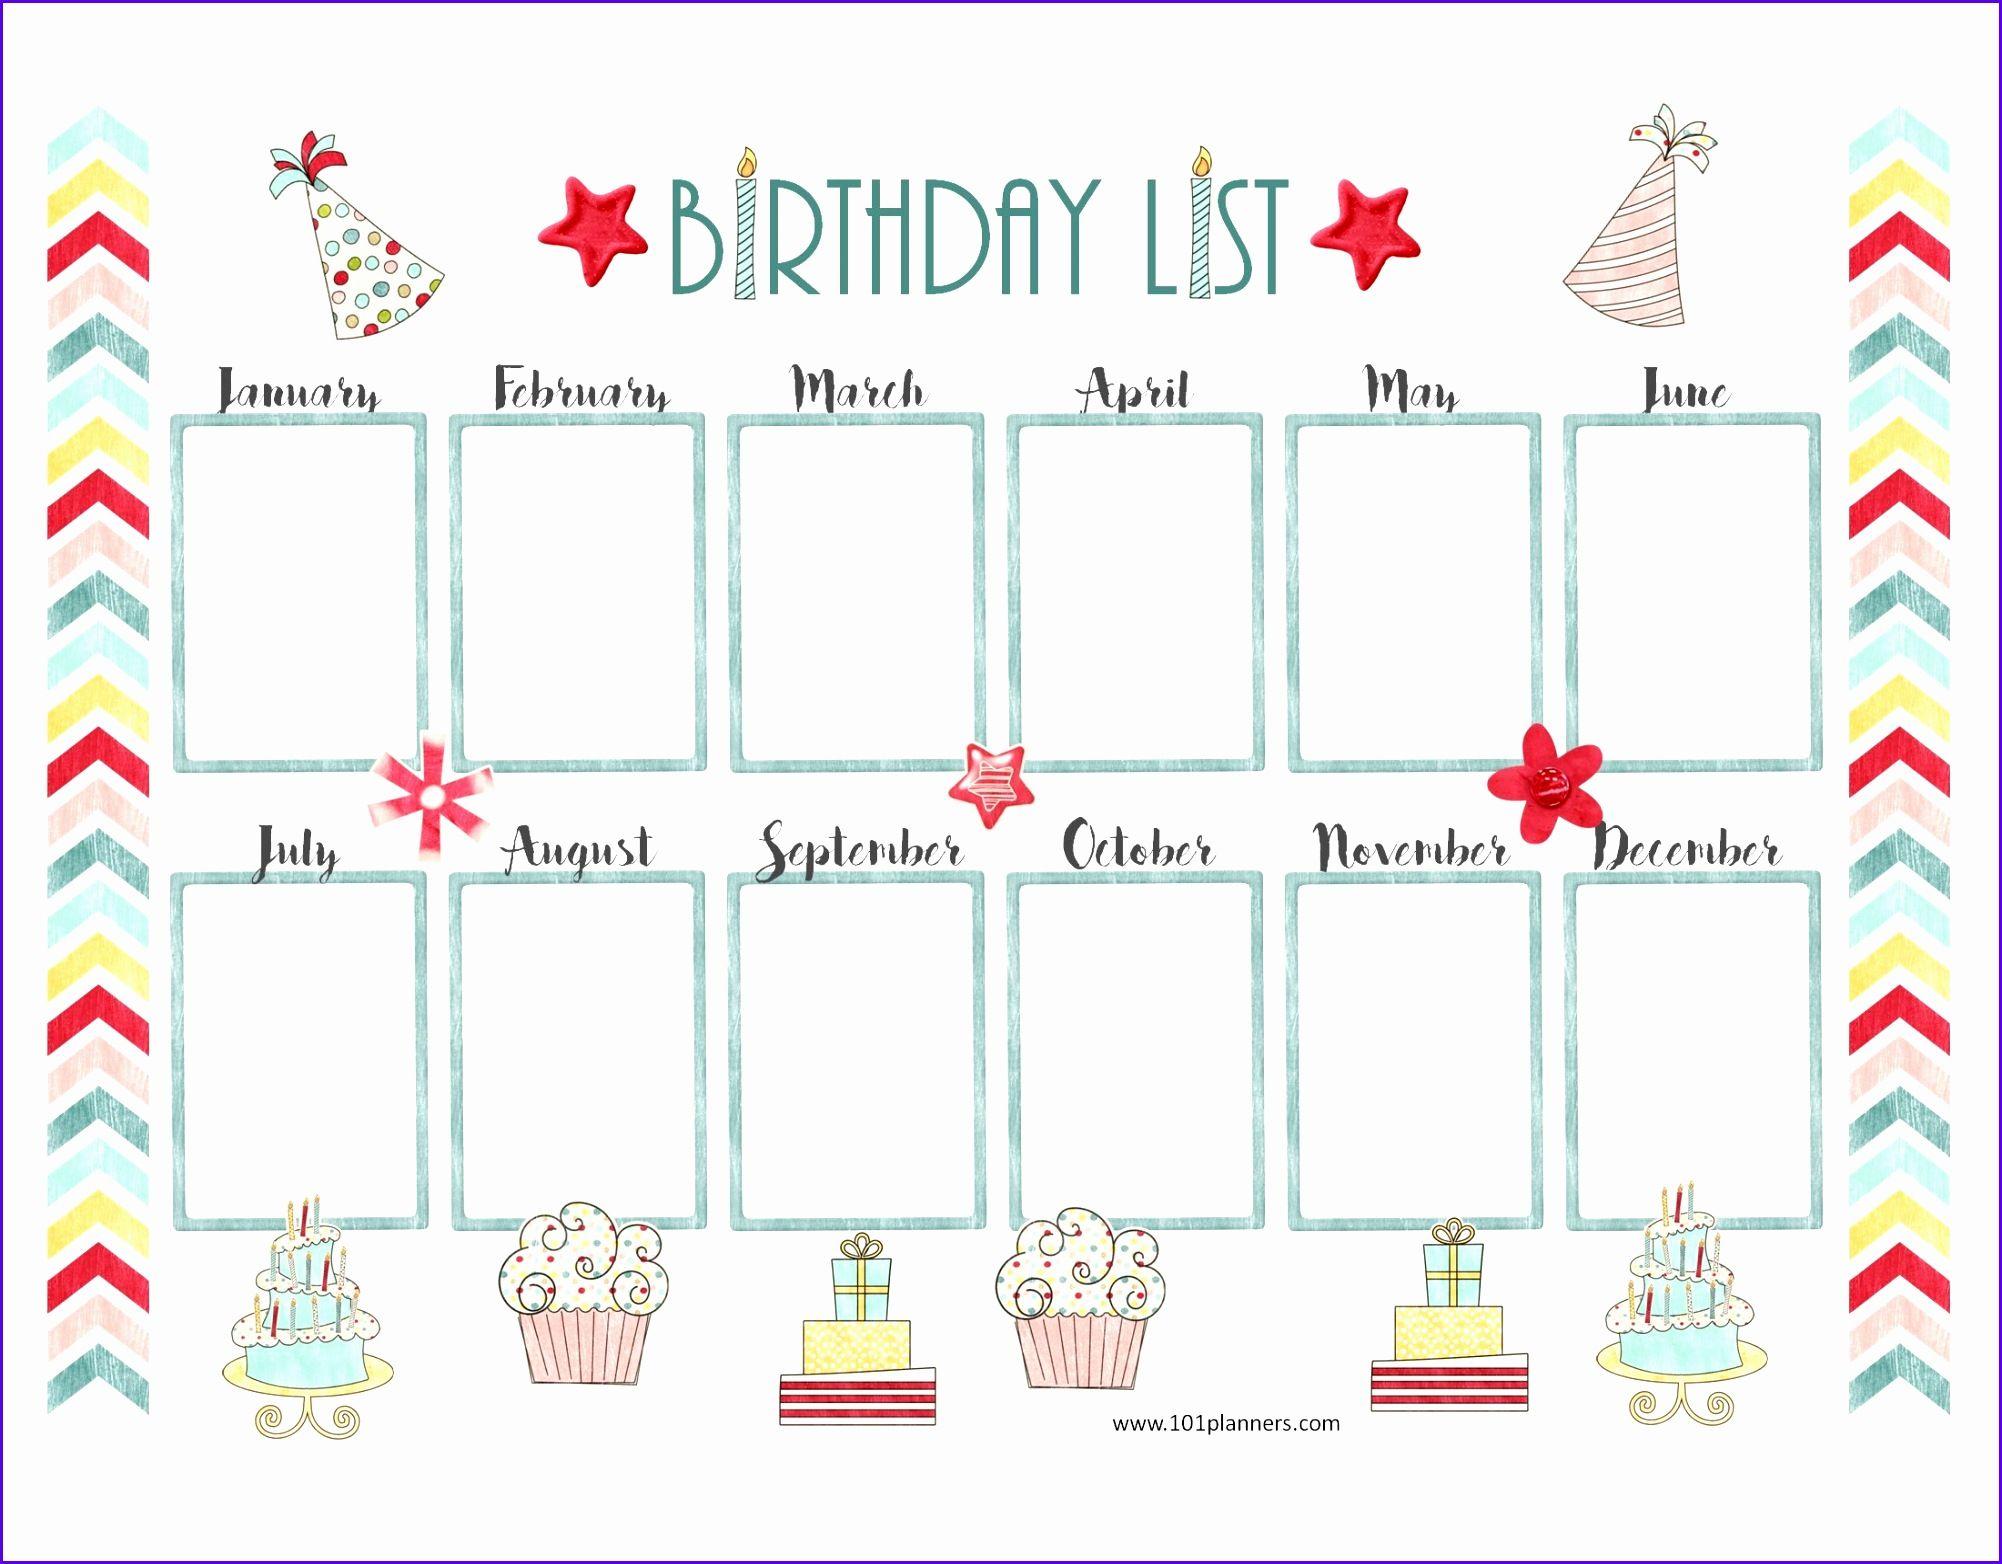 Sample Free Birthday Calendar Template Excel Gaklh Inspirational Free Birthday Calendar 2200170 Birthday Calendar Birthday Calendar Classroom Birthday Calender